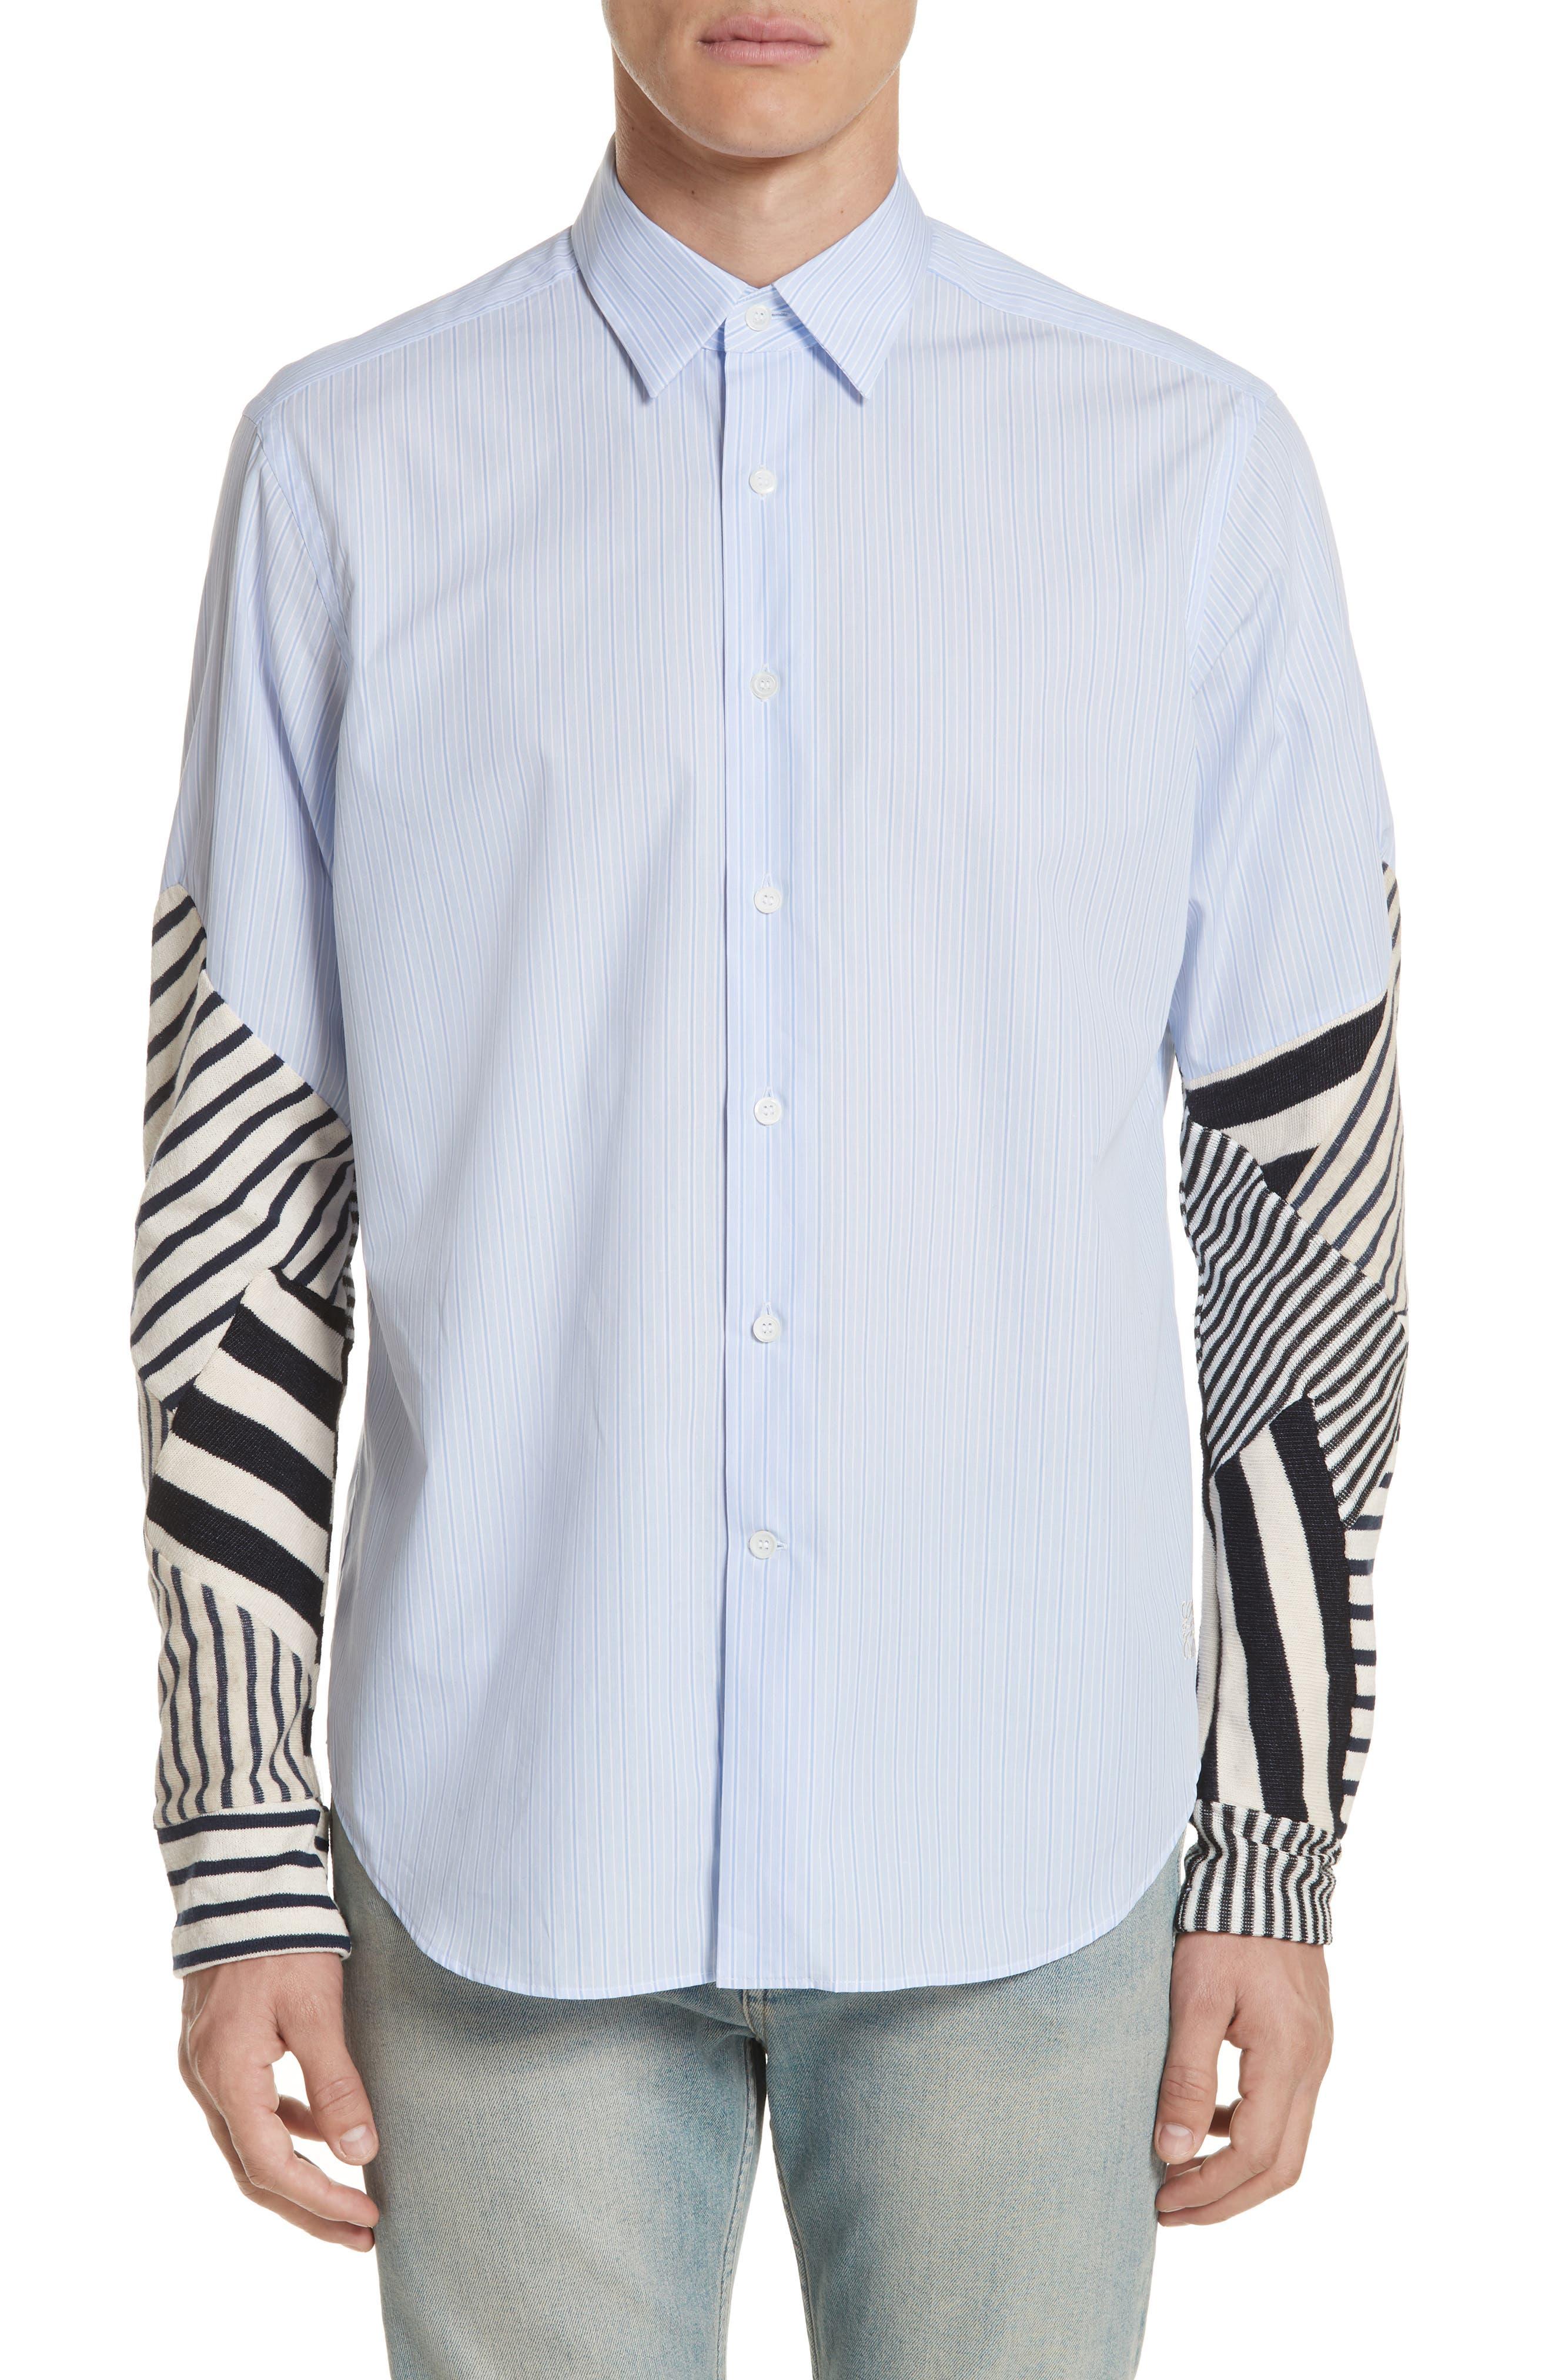 Loewe Patchwork Sleeve Shirt